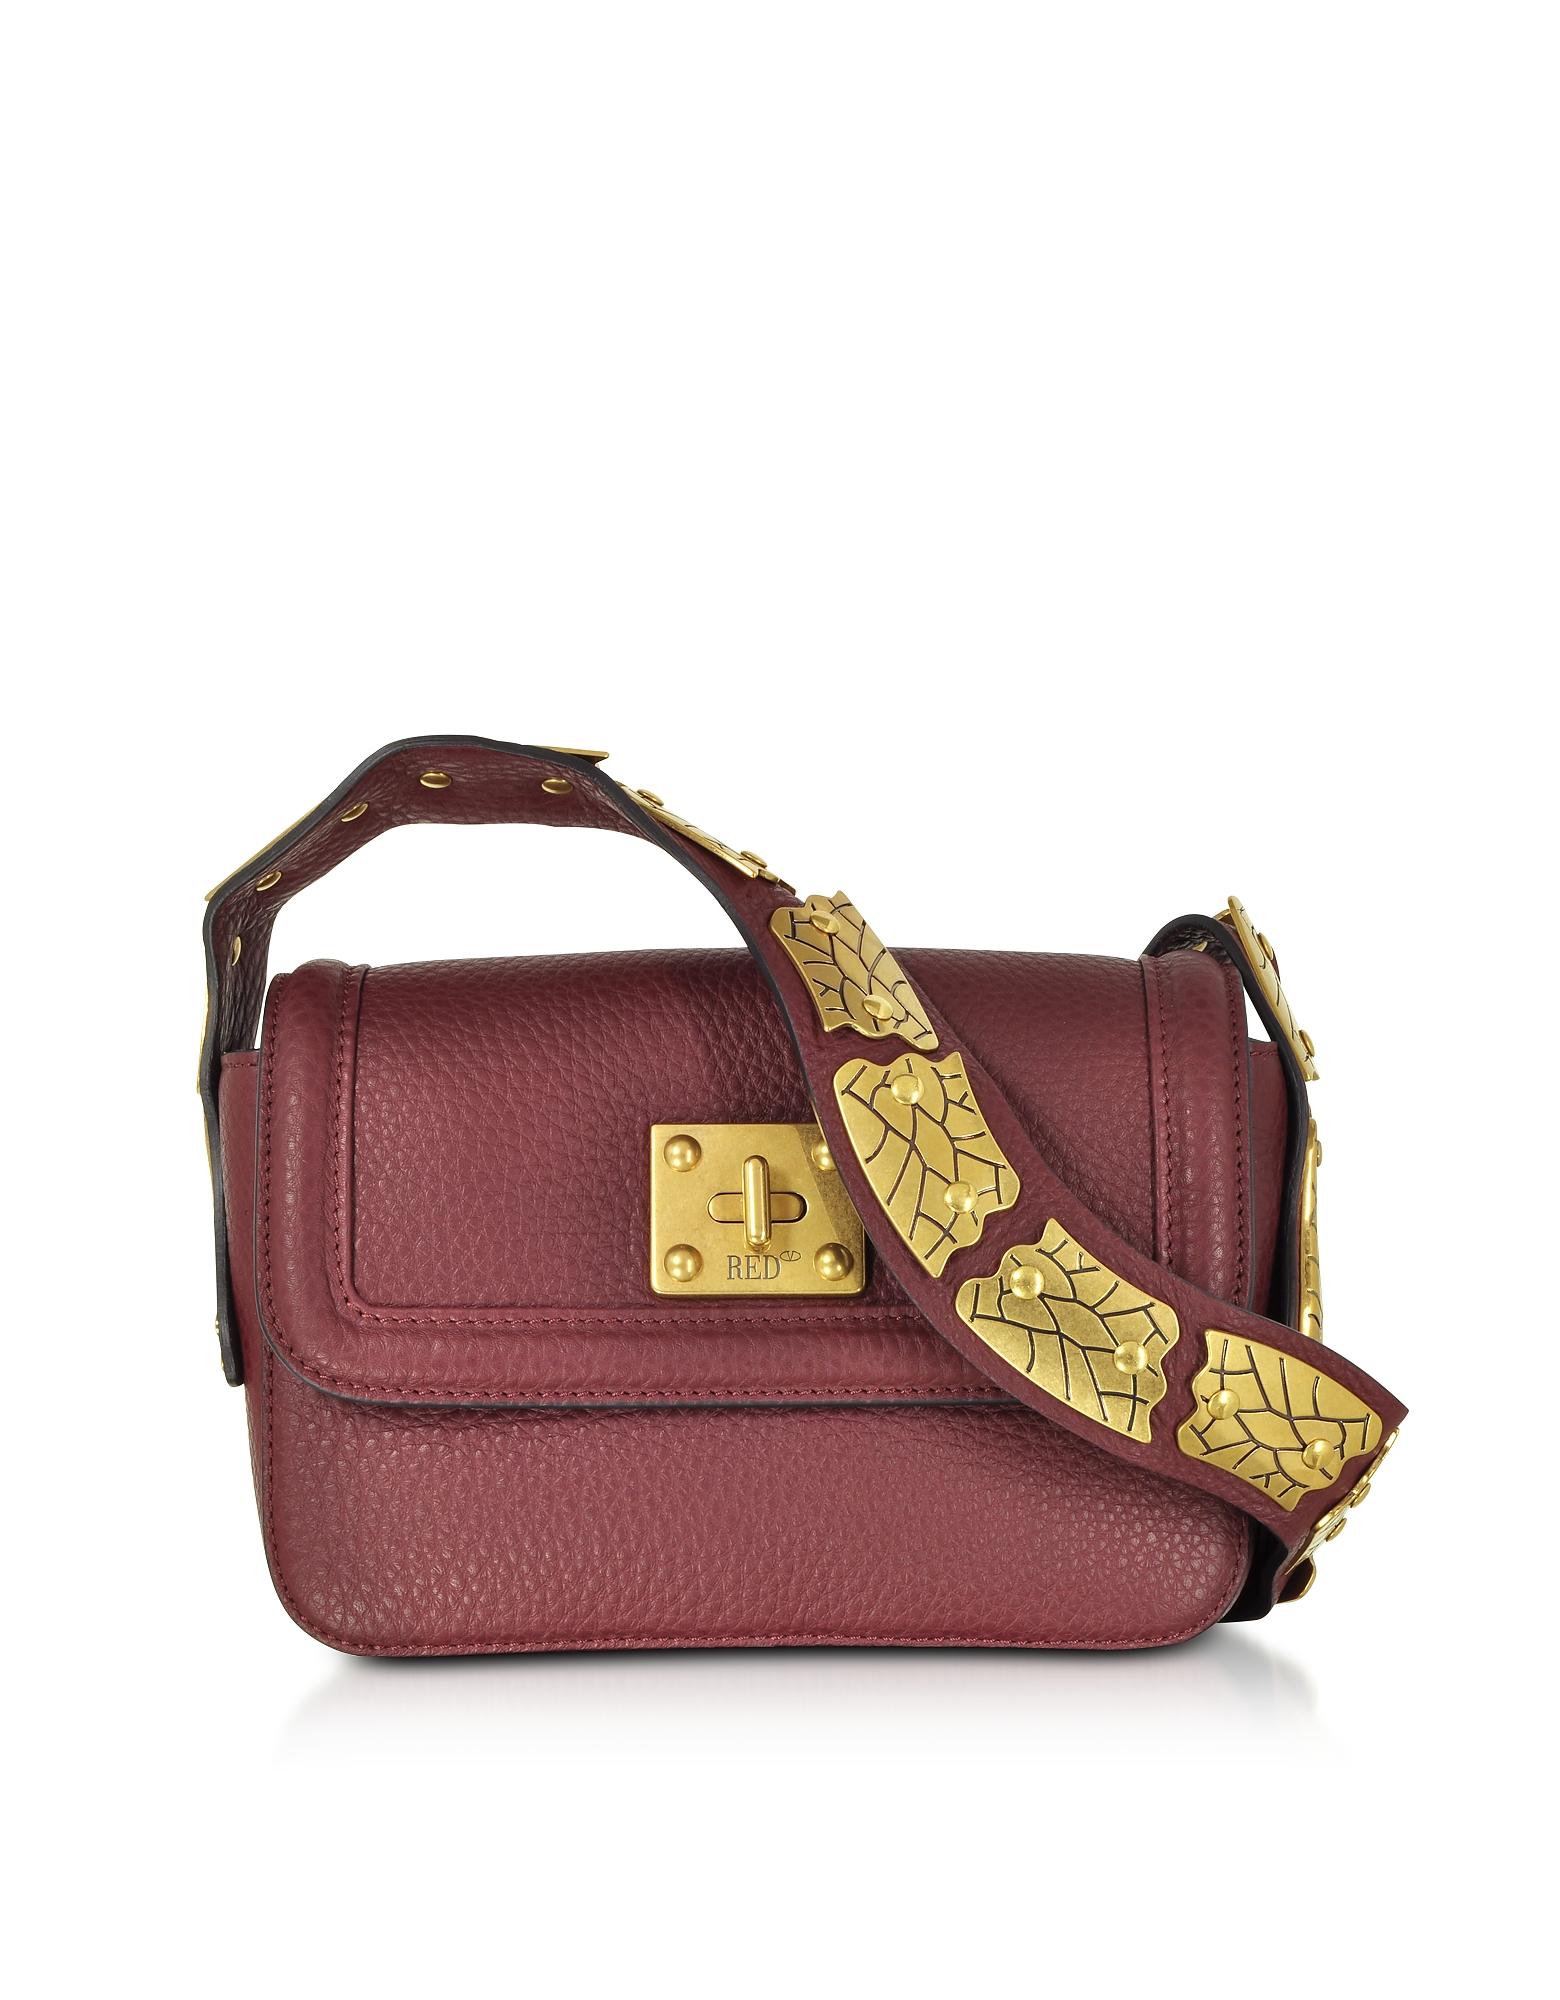 RED Valentino Handbags, Wine Pebble Leather Sin Crossbody Bag